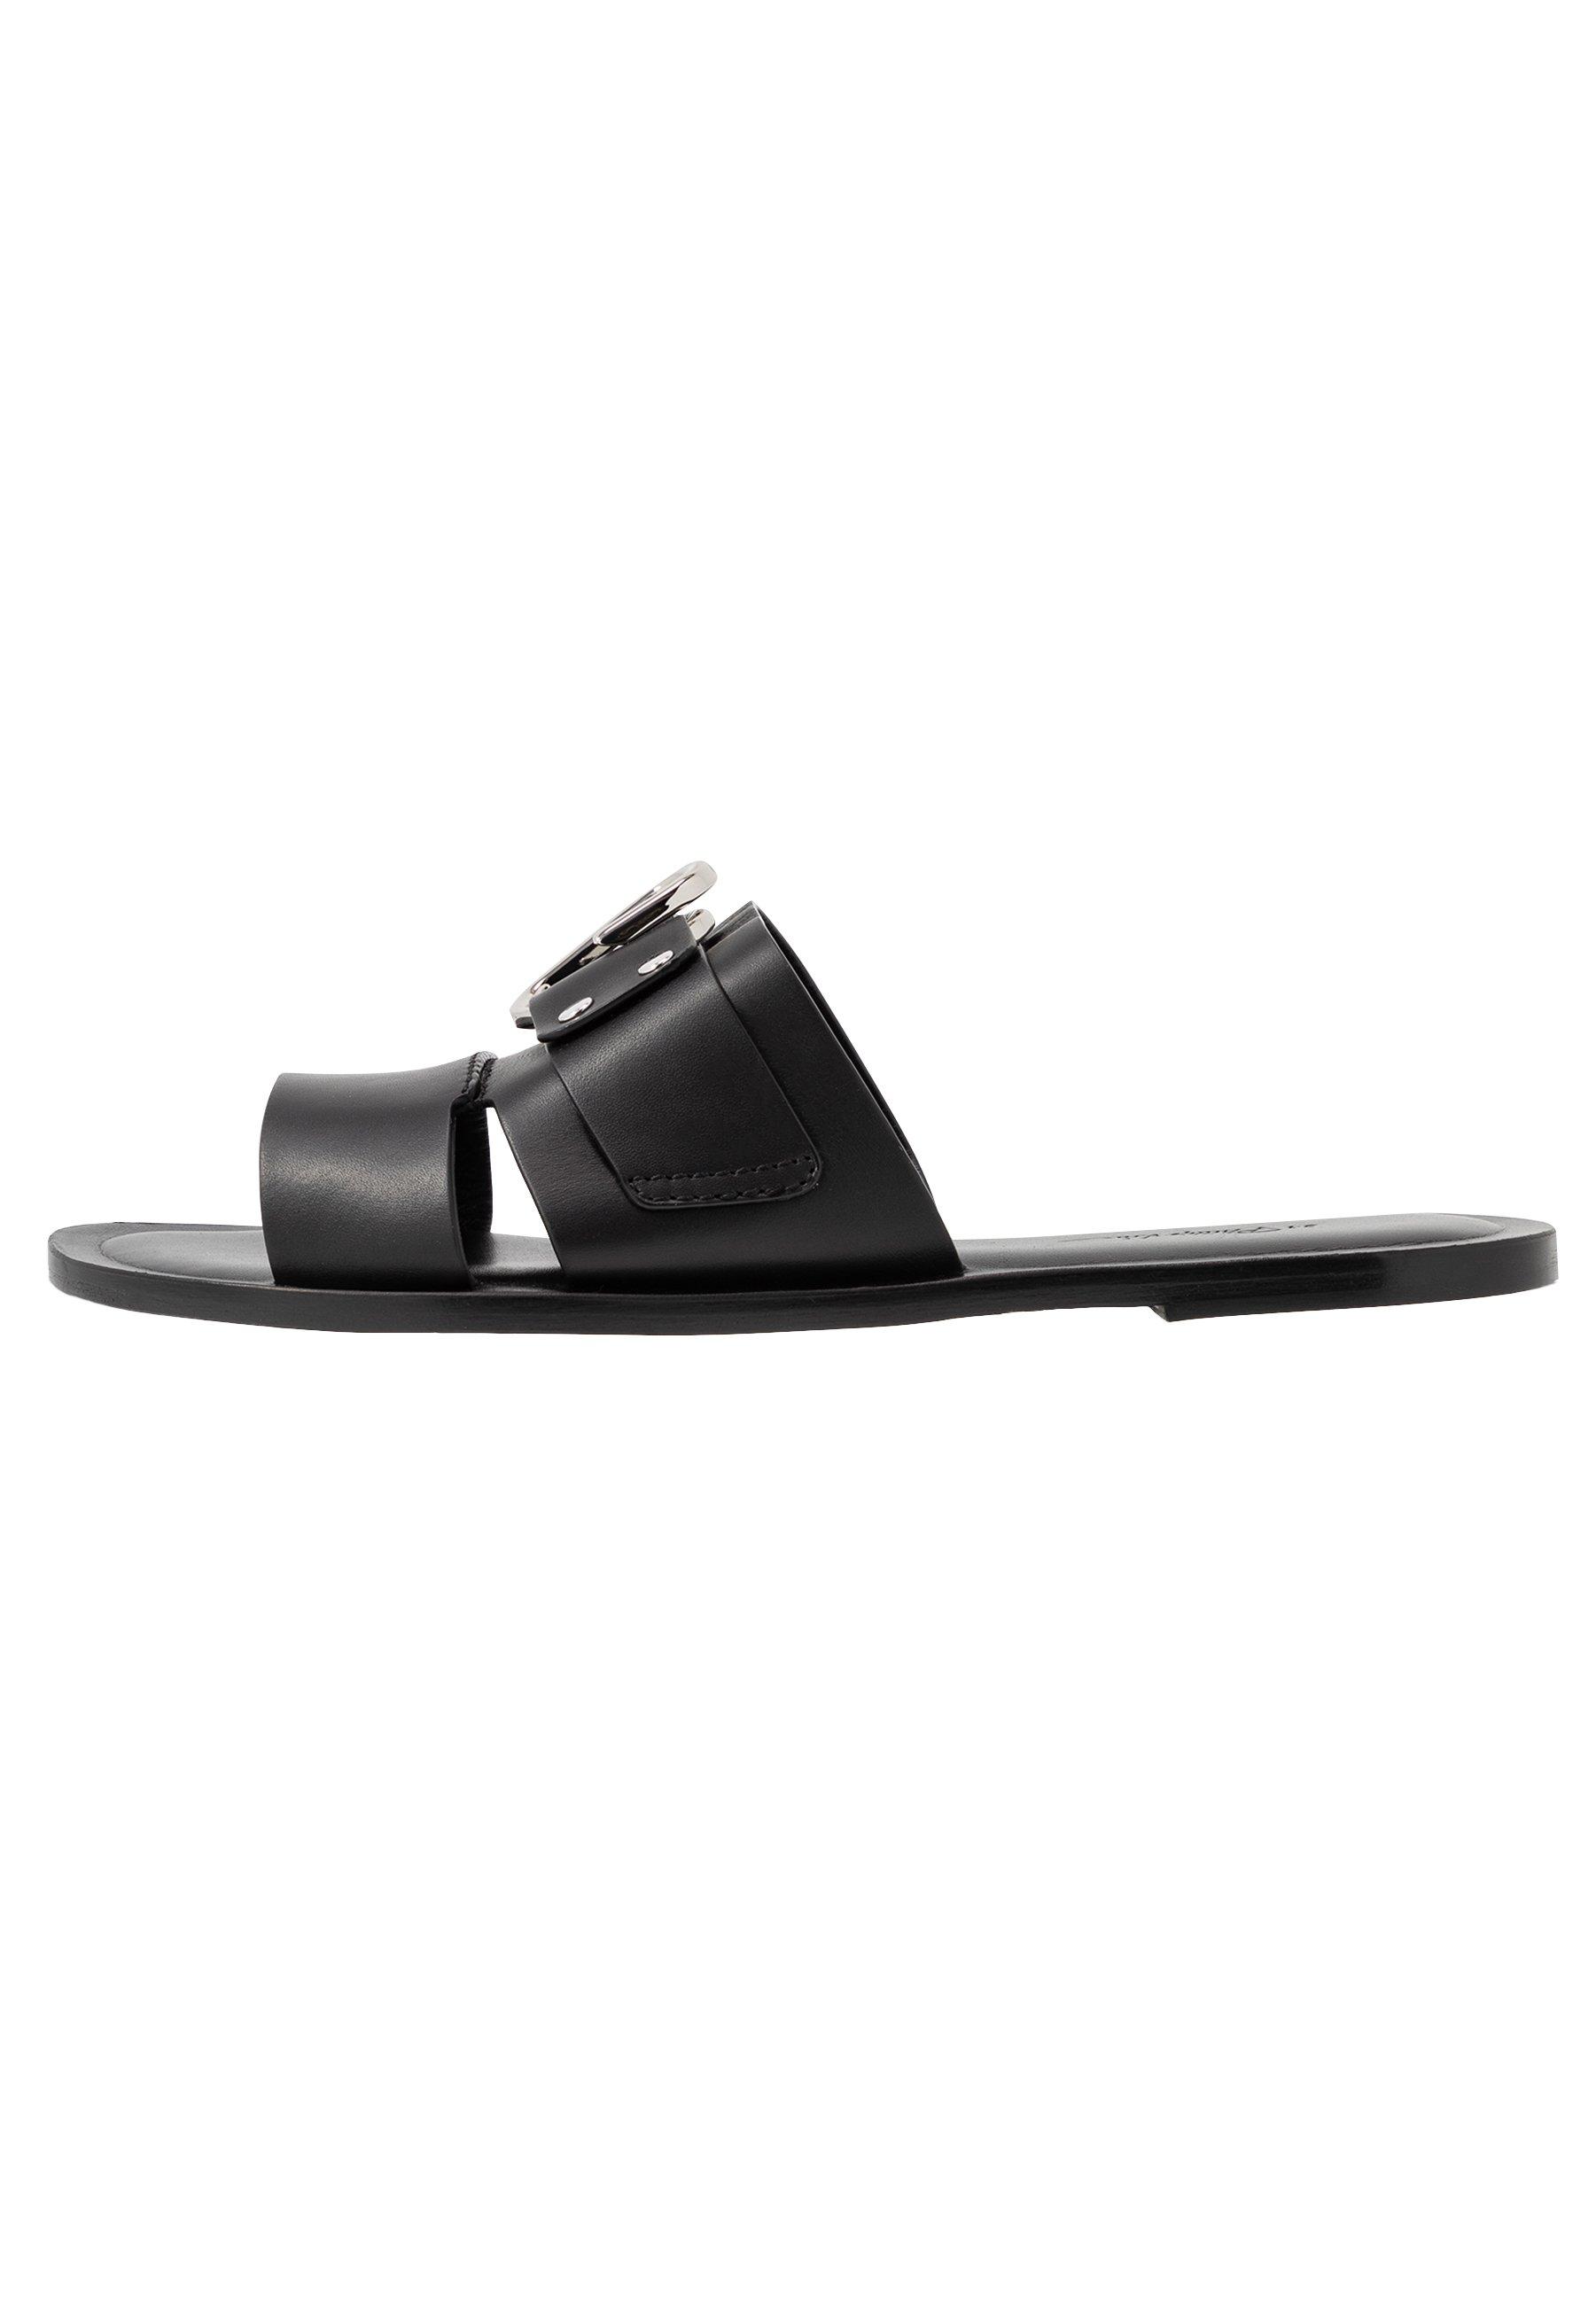 3.1 Phillip Lim Alix Flat Slide - Slip-ins Black